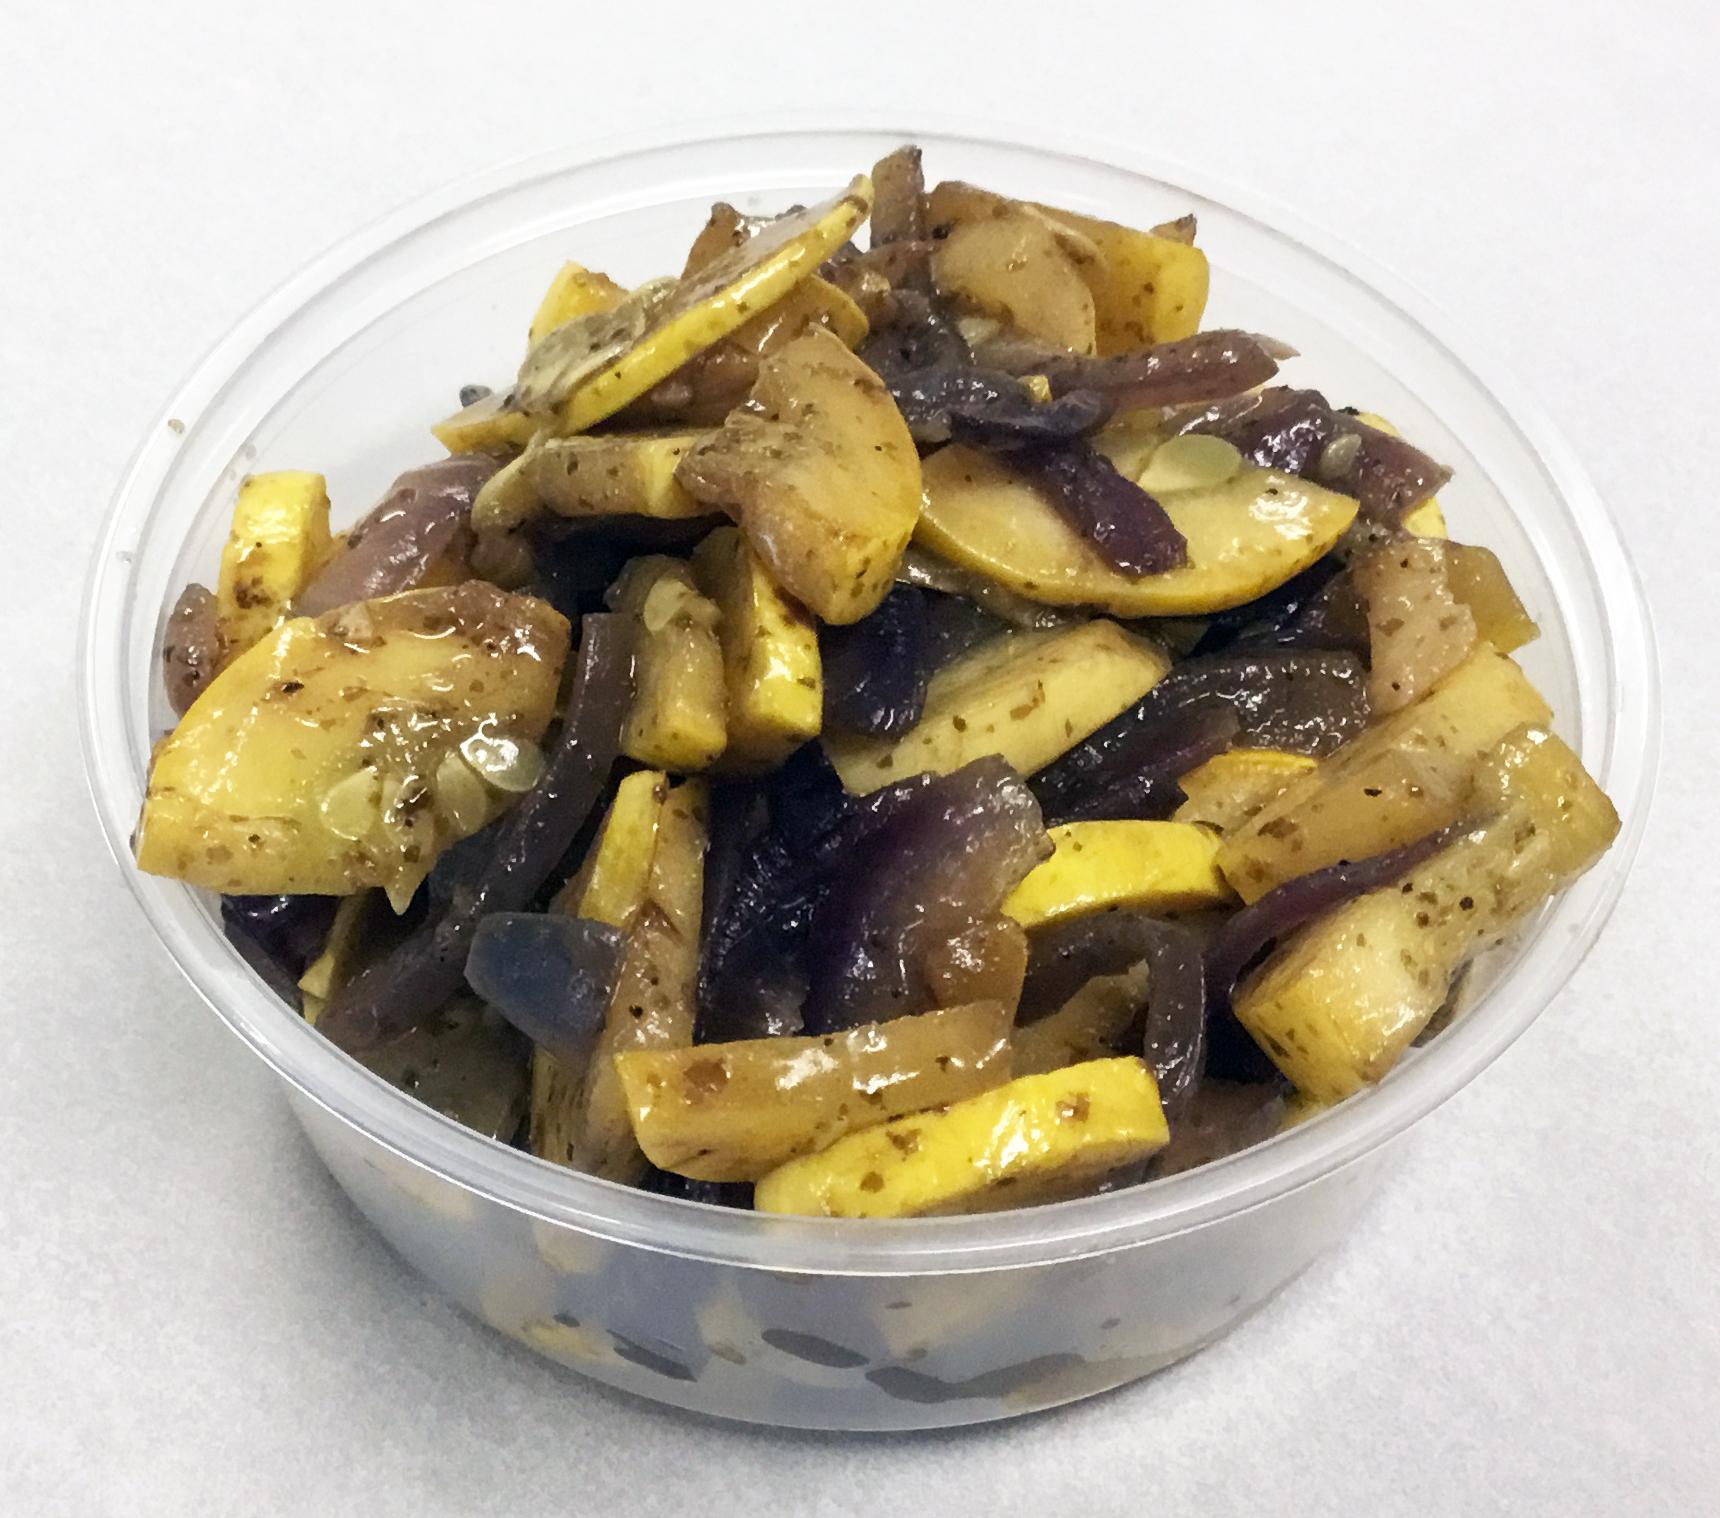 Sauteed yellow squash with red onion, nori flakes (seaweed) and tamari.